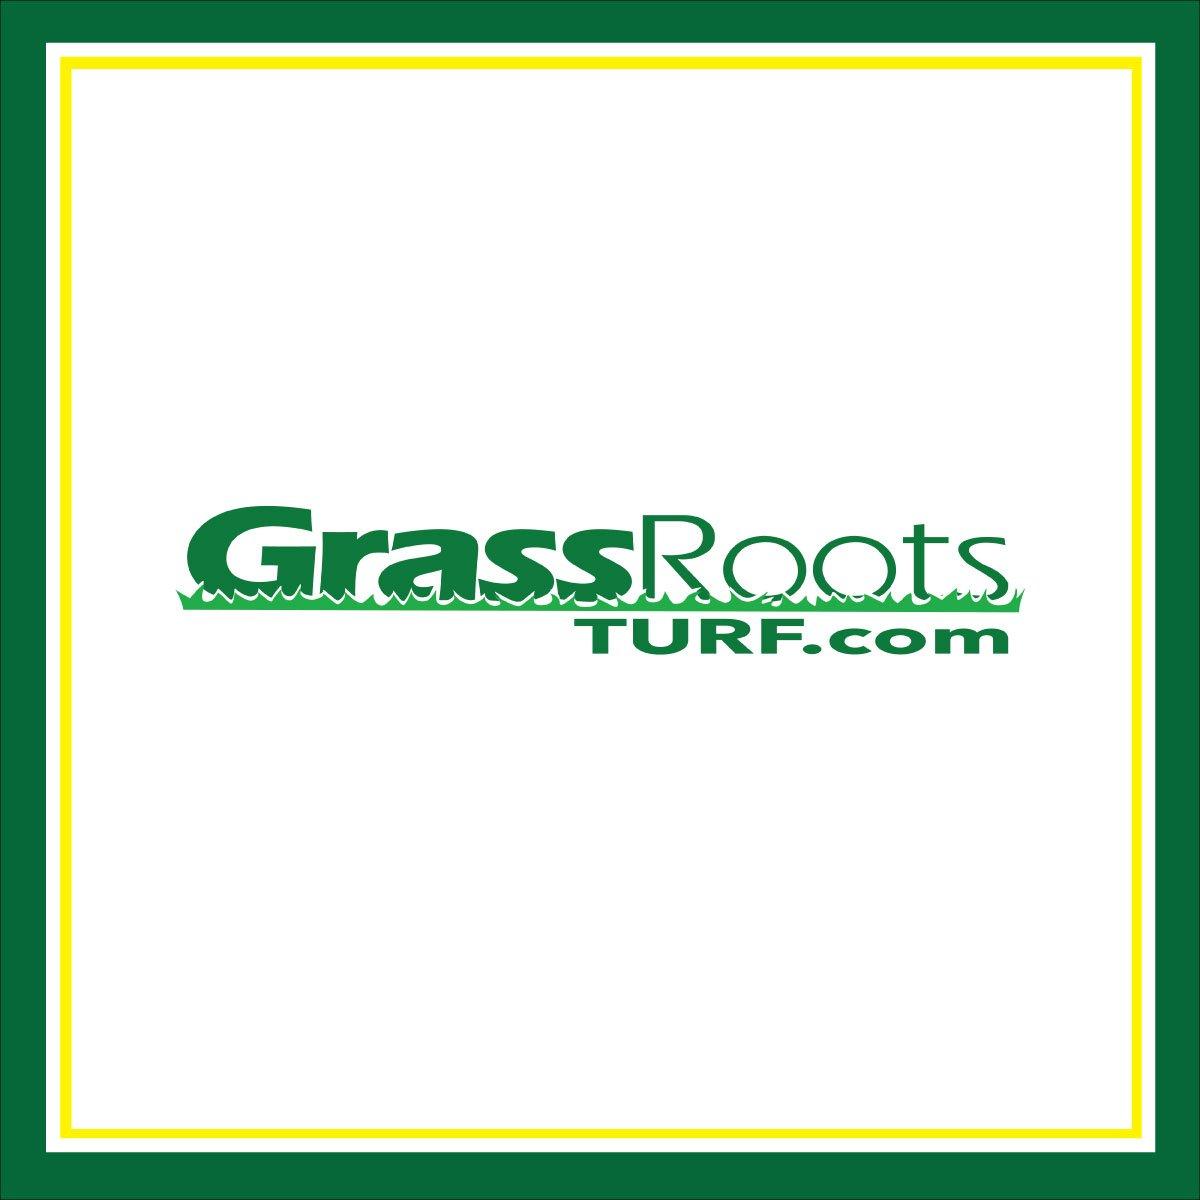 GrassRoots Turf Franchise LLC